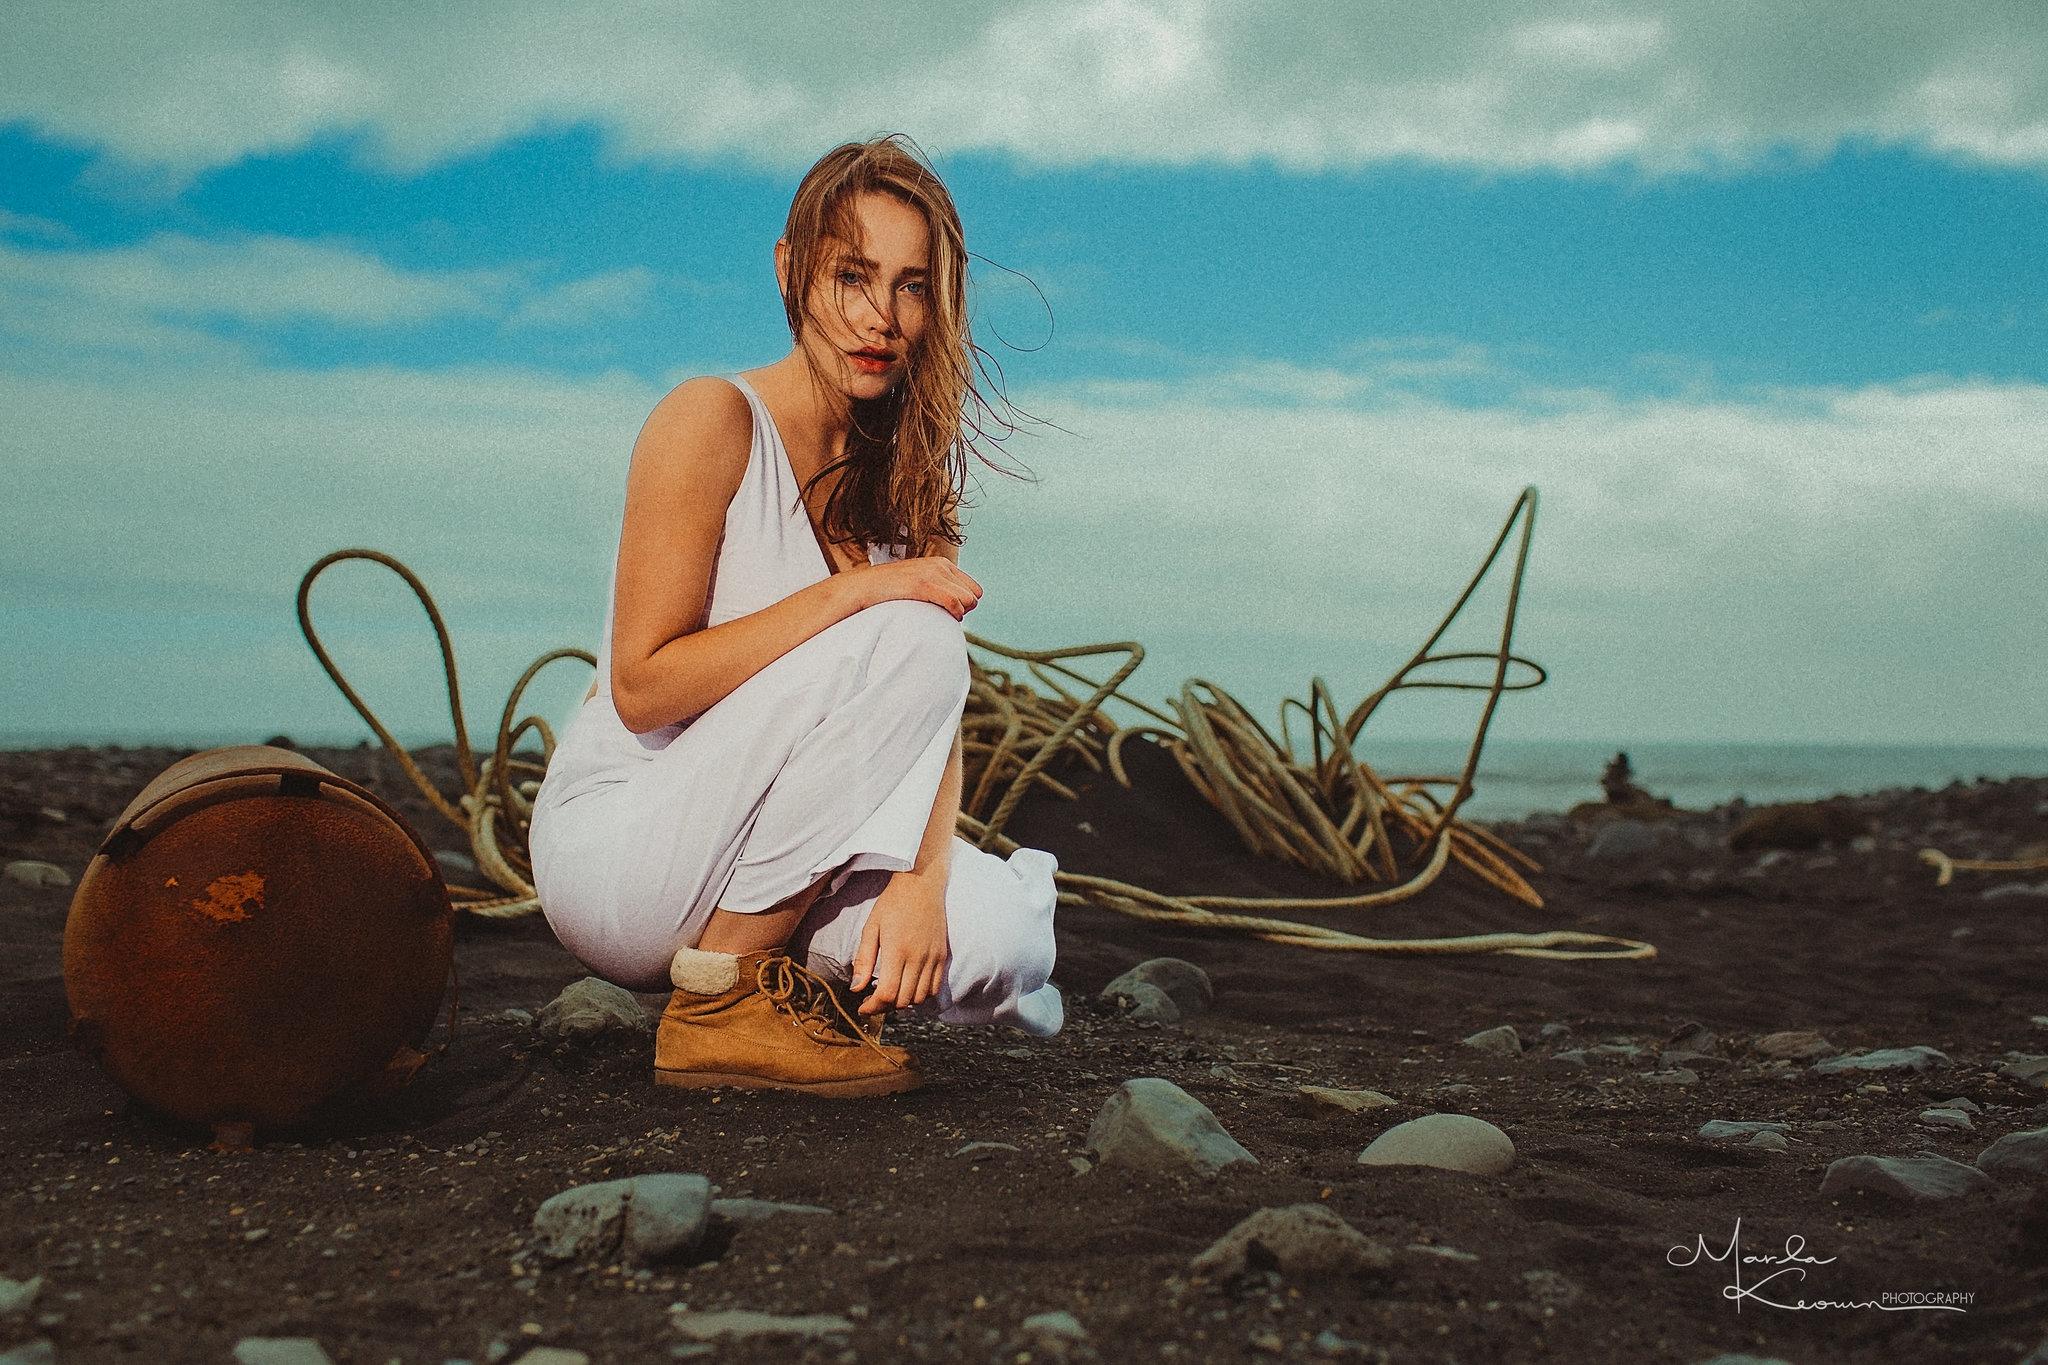 20180715-4826K-SólheimasandurPhotoshoot-0192-Edit-WM.jpg